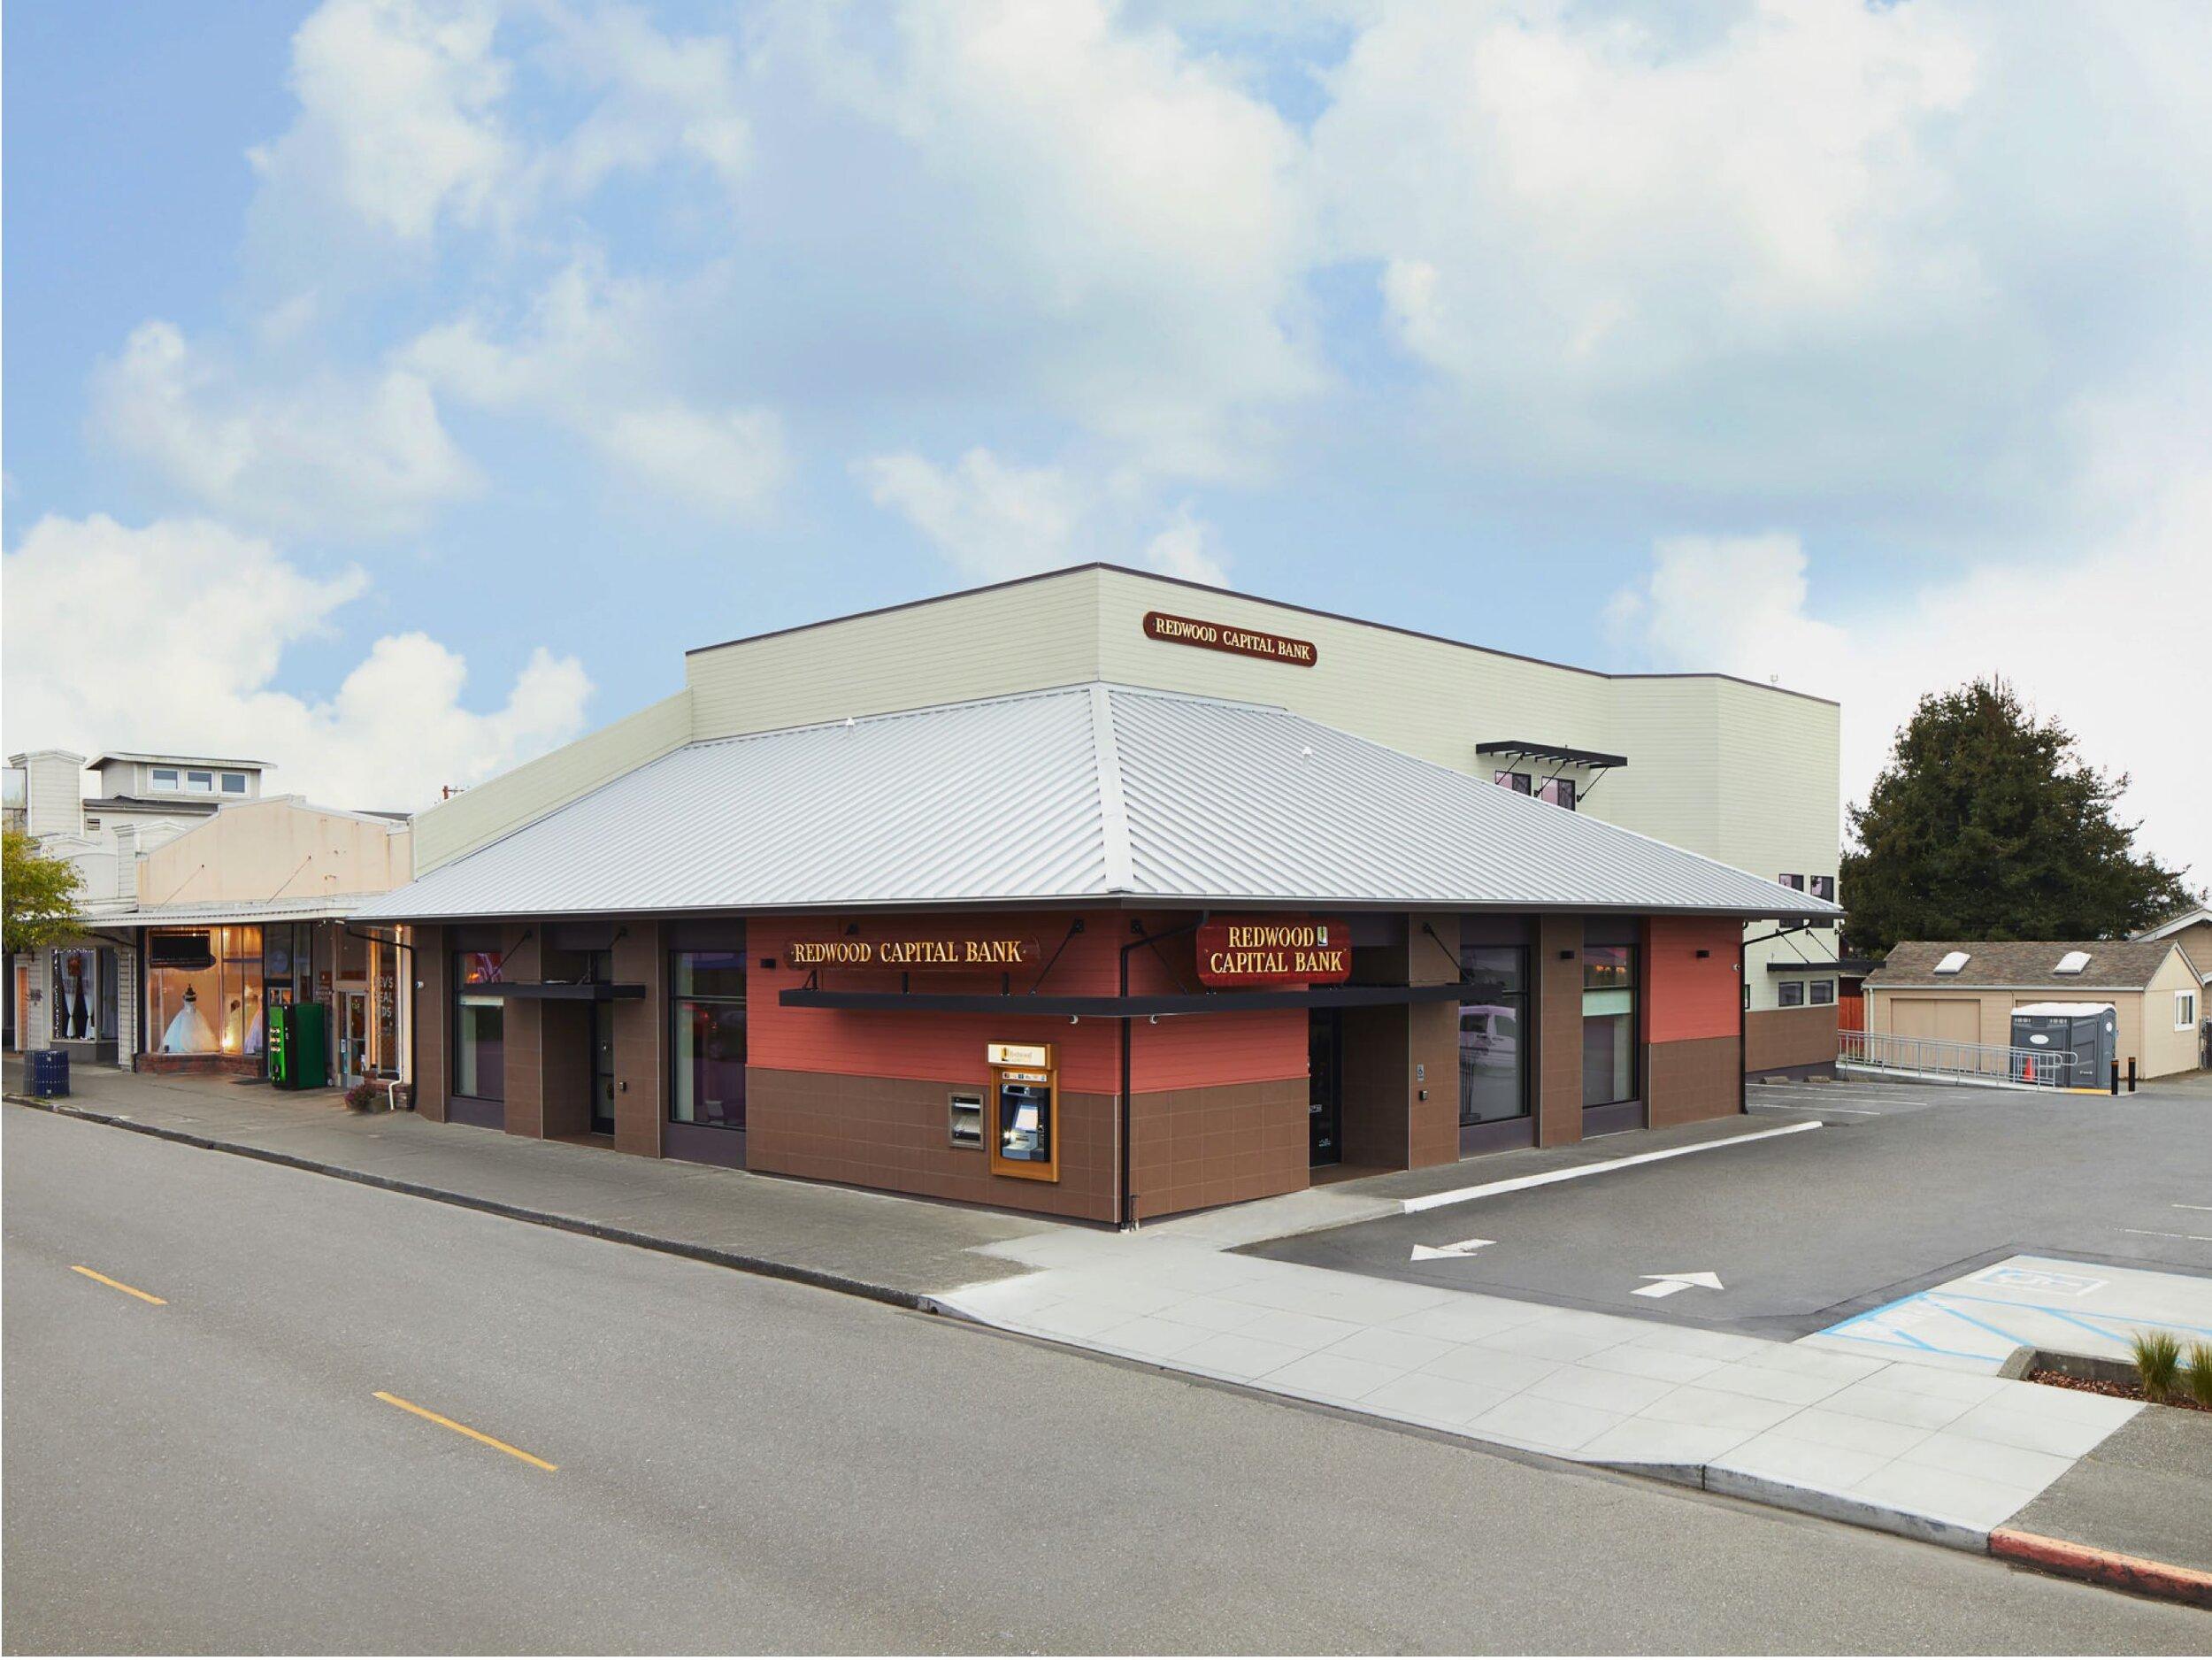 REDWOOD CAPITAL BANK - HENDERSON CENTER BRANCH